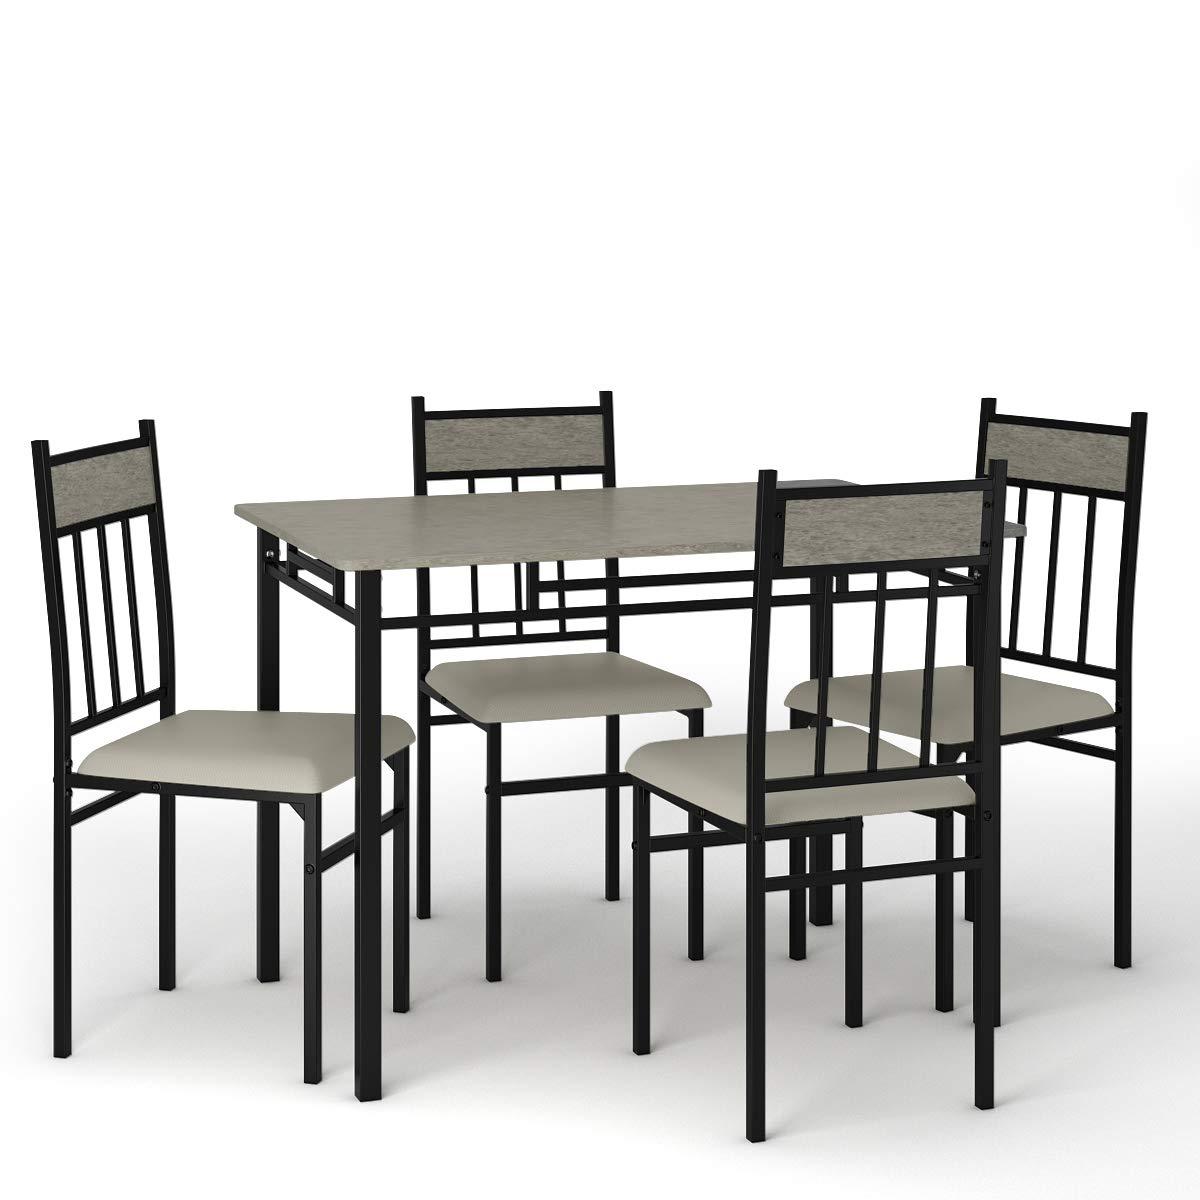 Tangkula 5 Piece Kitchen Dining Table Set